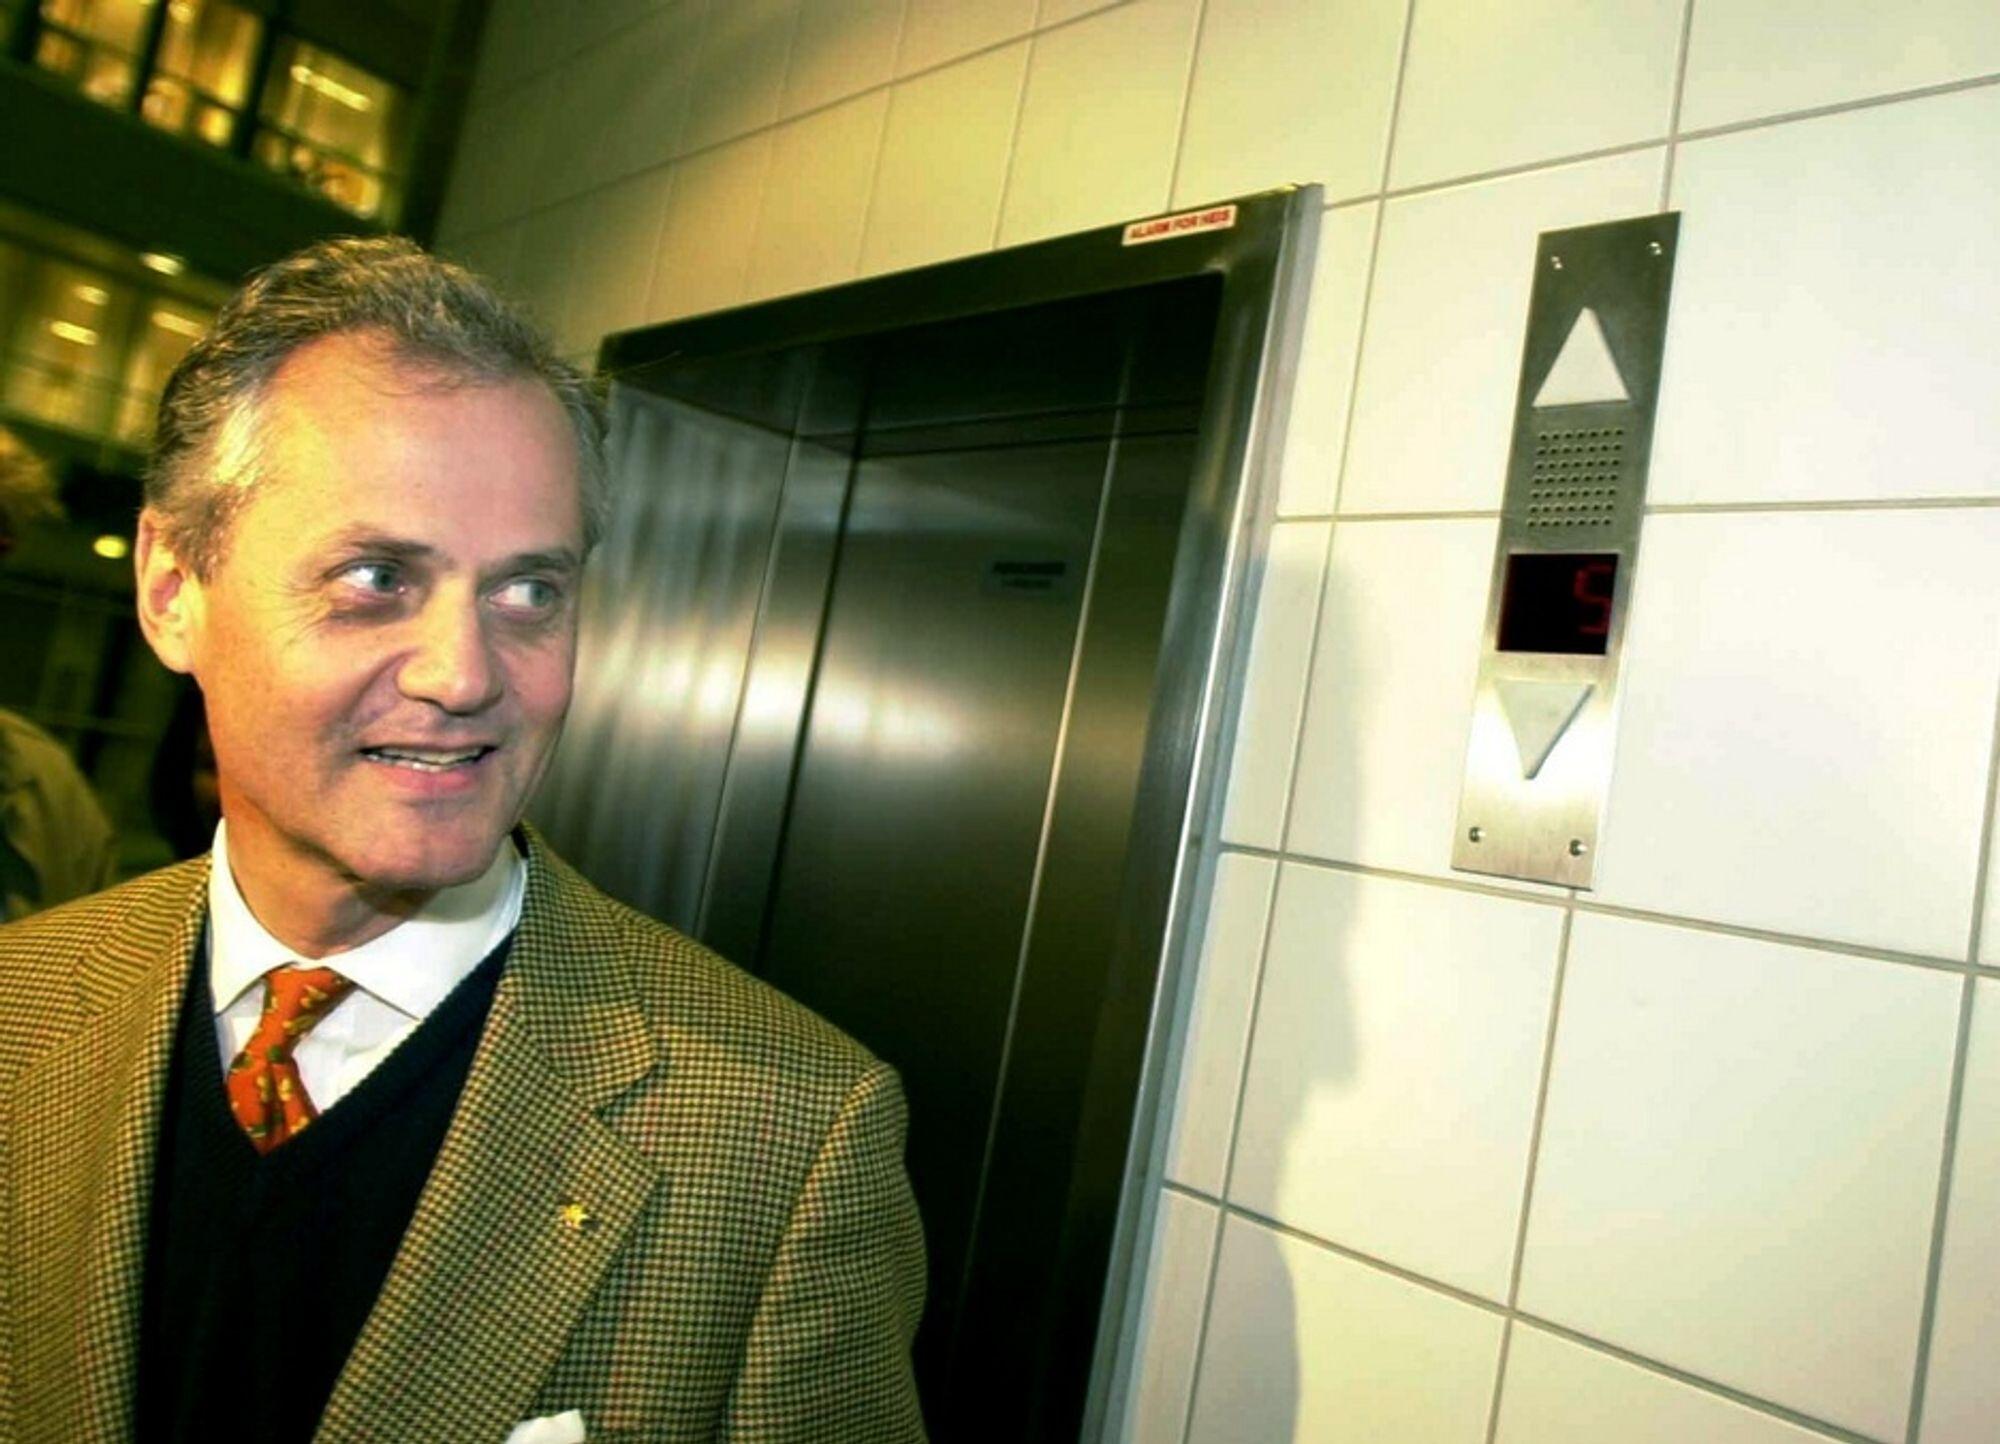 Kristian Siem vil flytte en flåte på 25 fartøy hjem til Norge. Han liker den nye rederiskatteordningen.